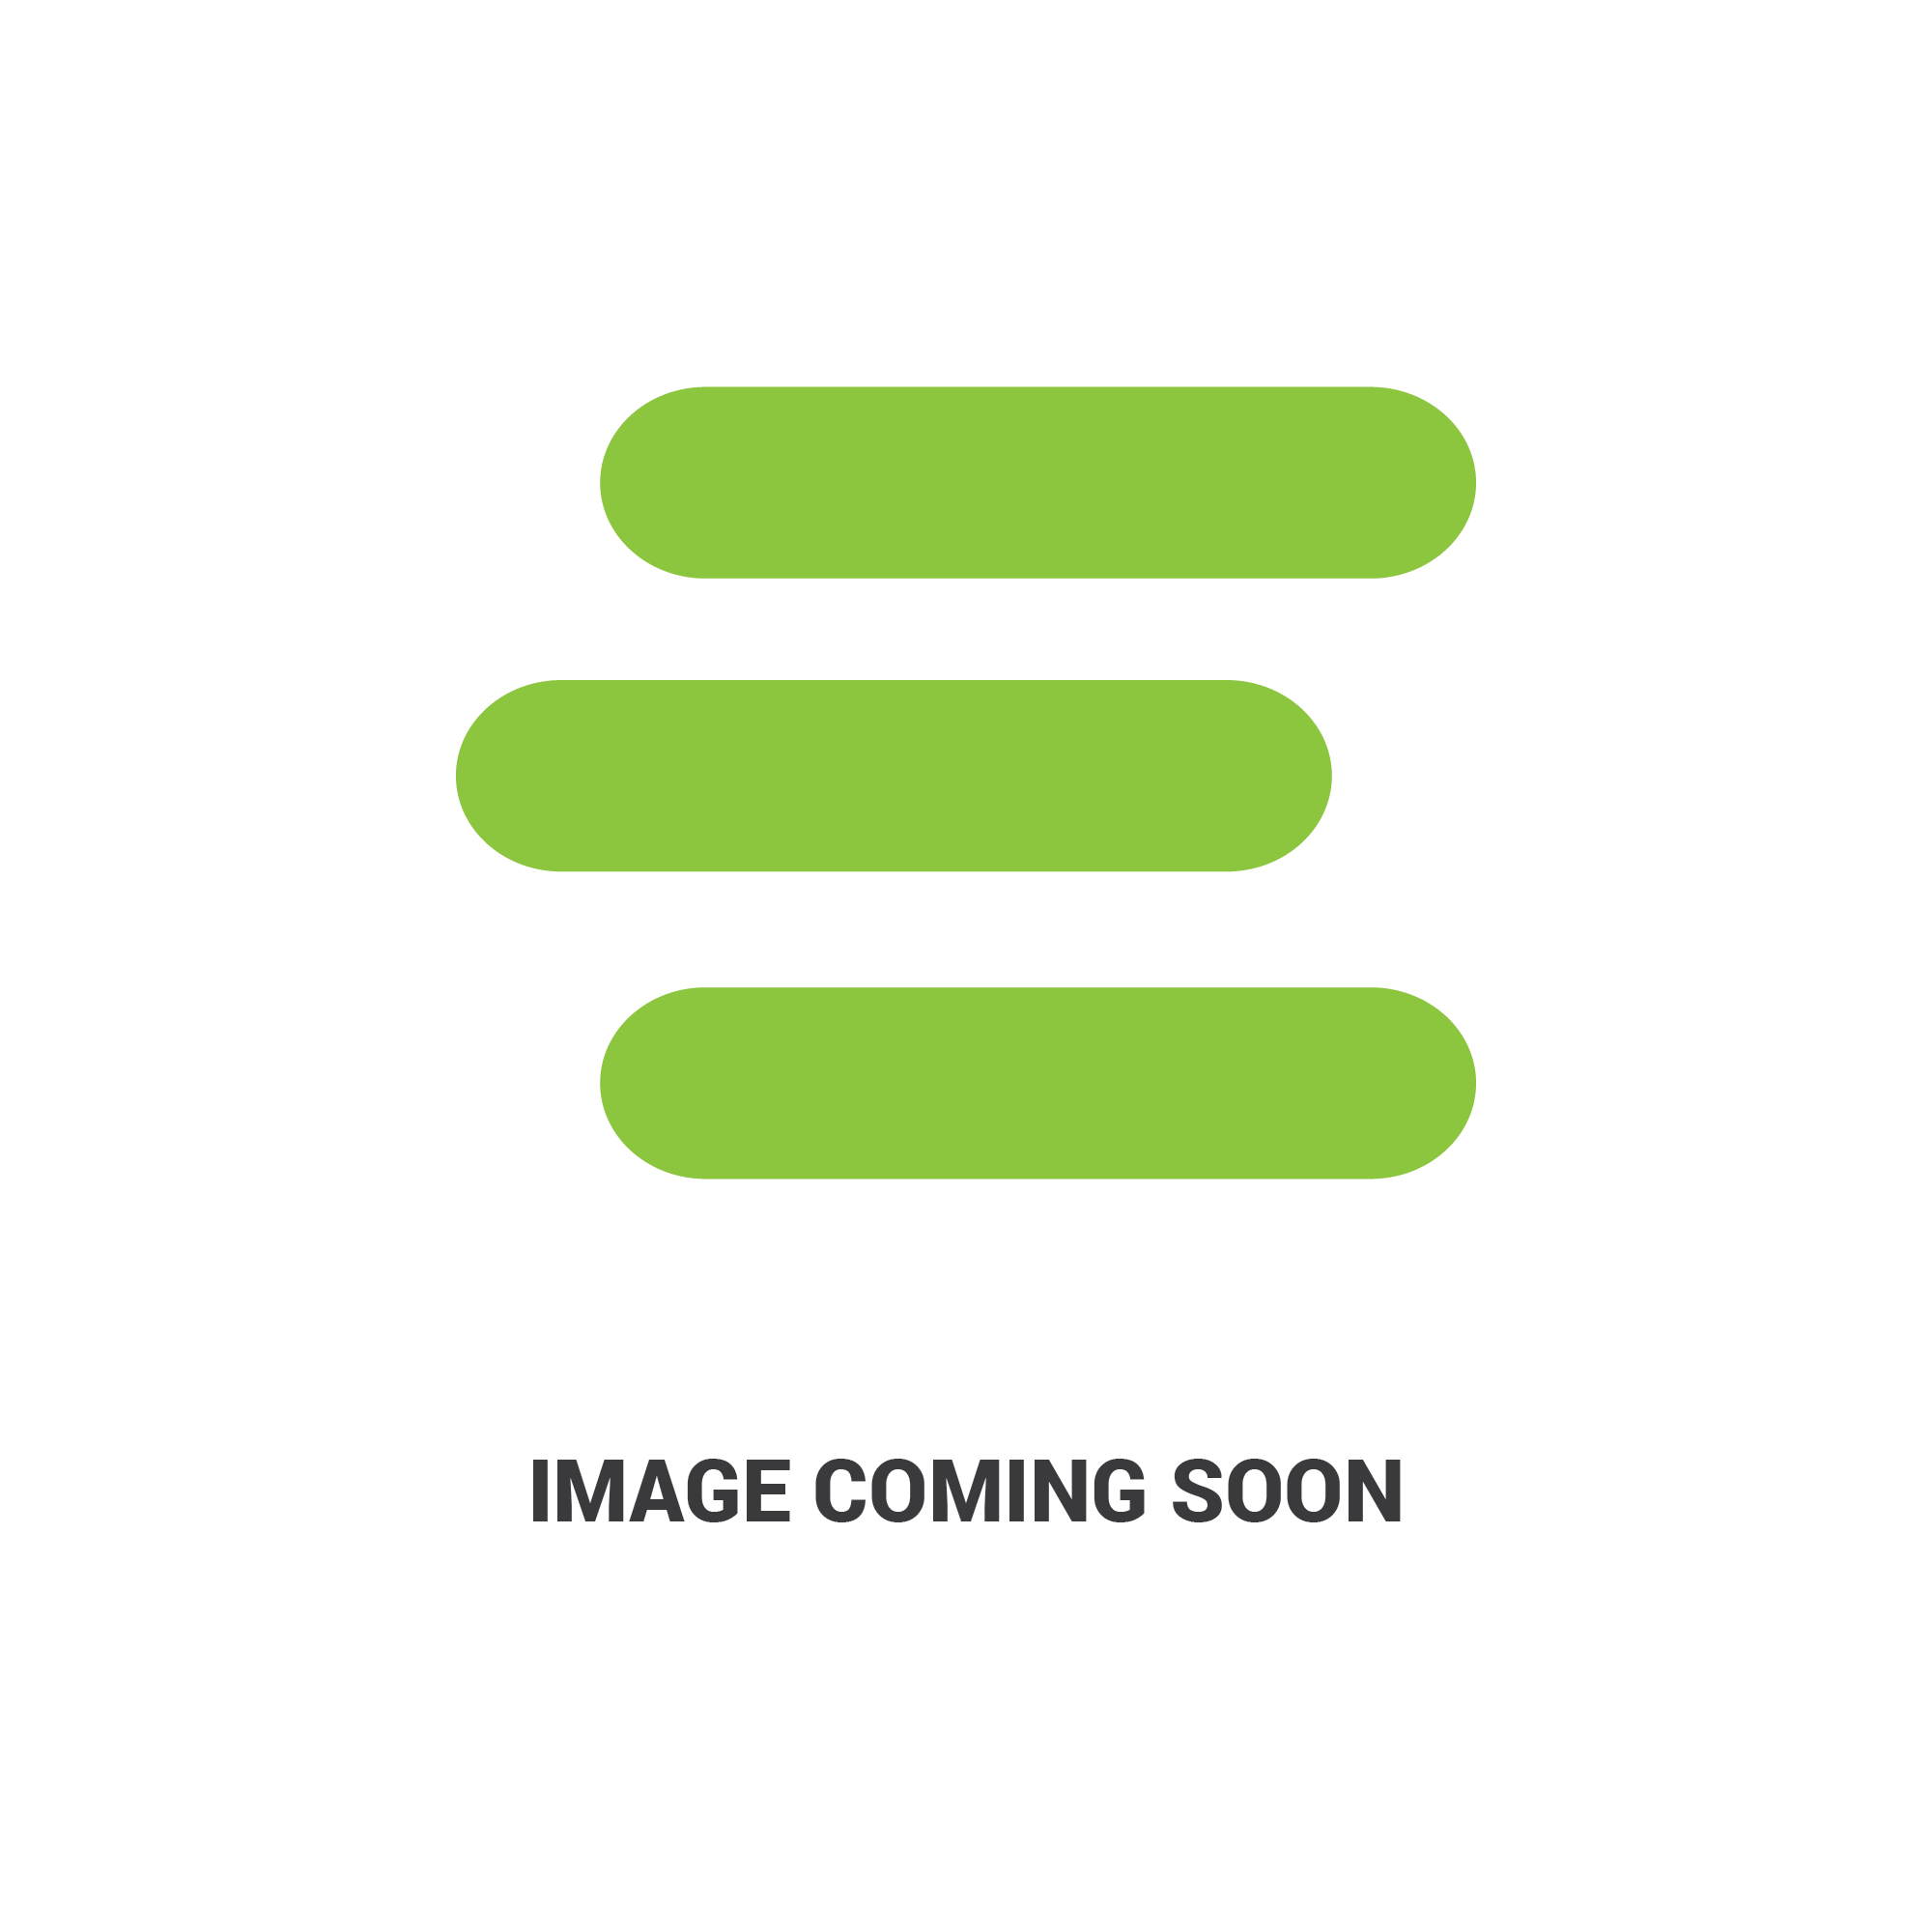 E-15231-65950edit 1.jpg